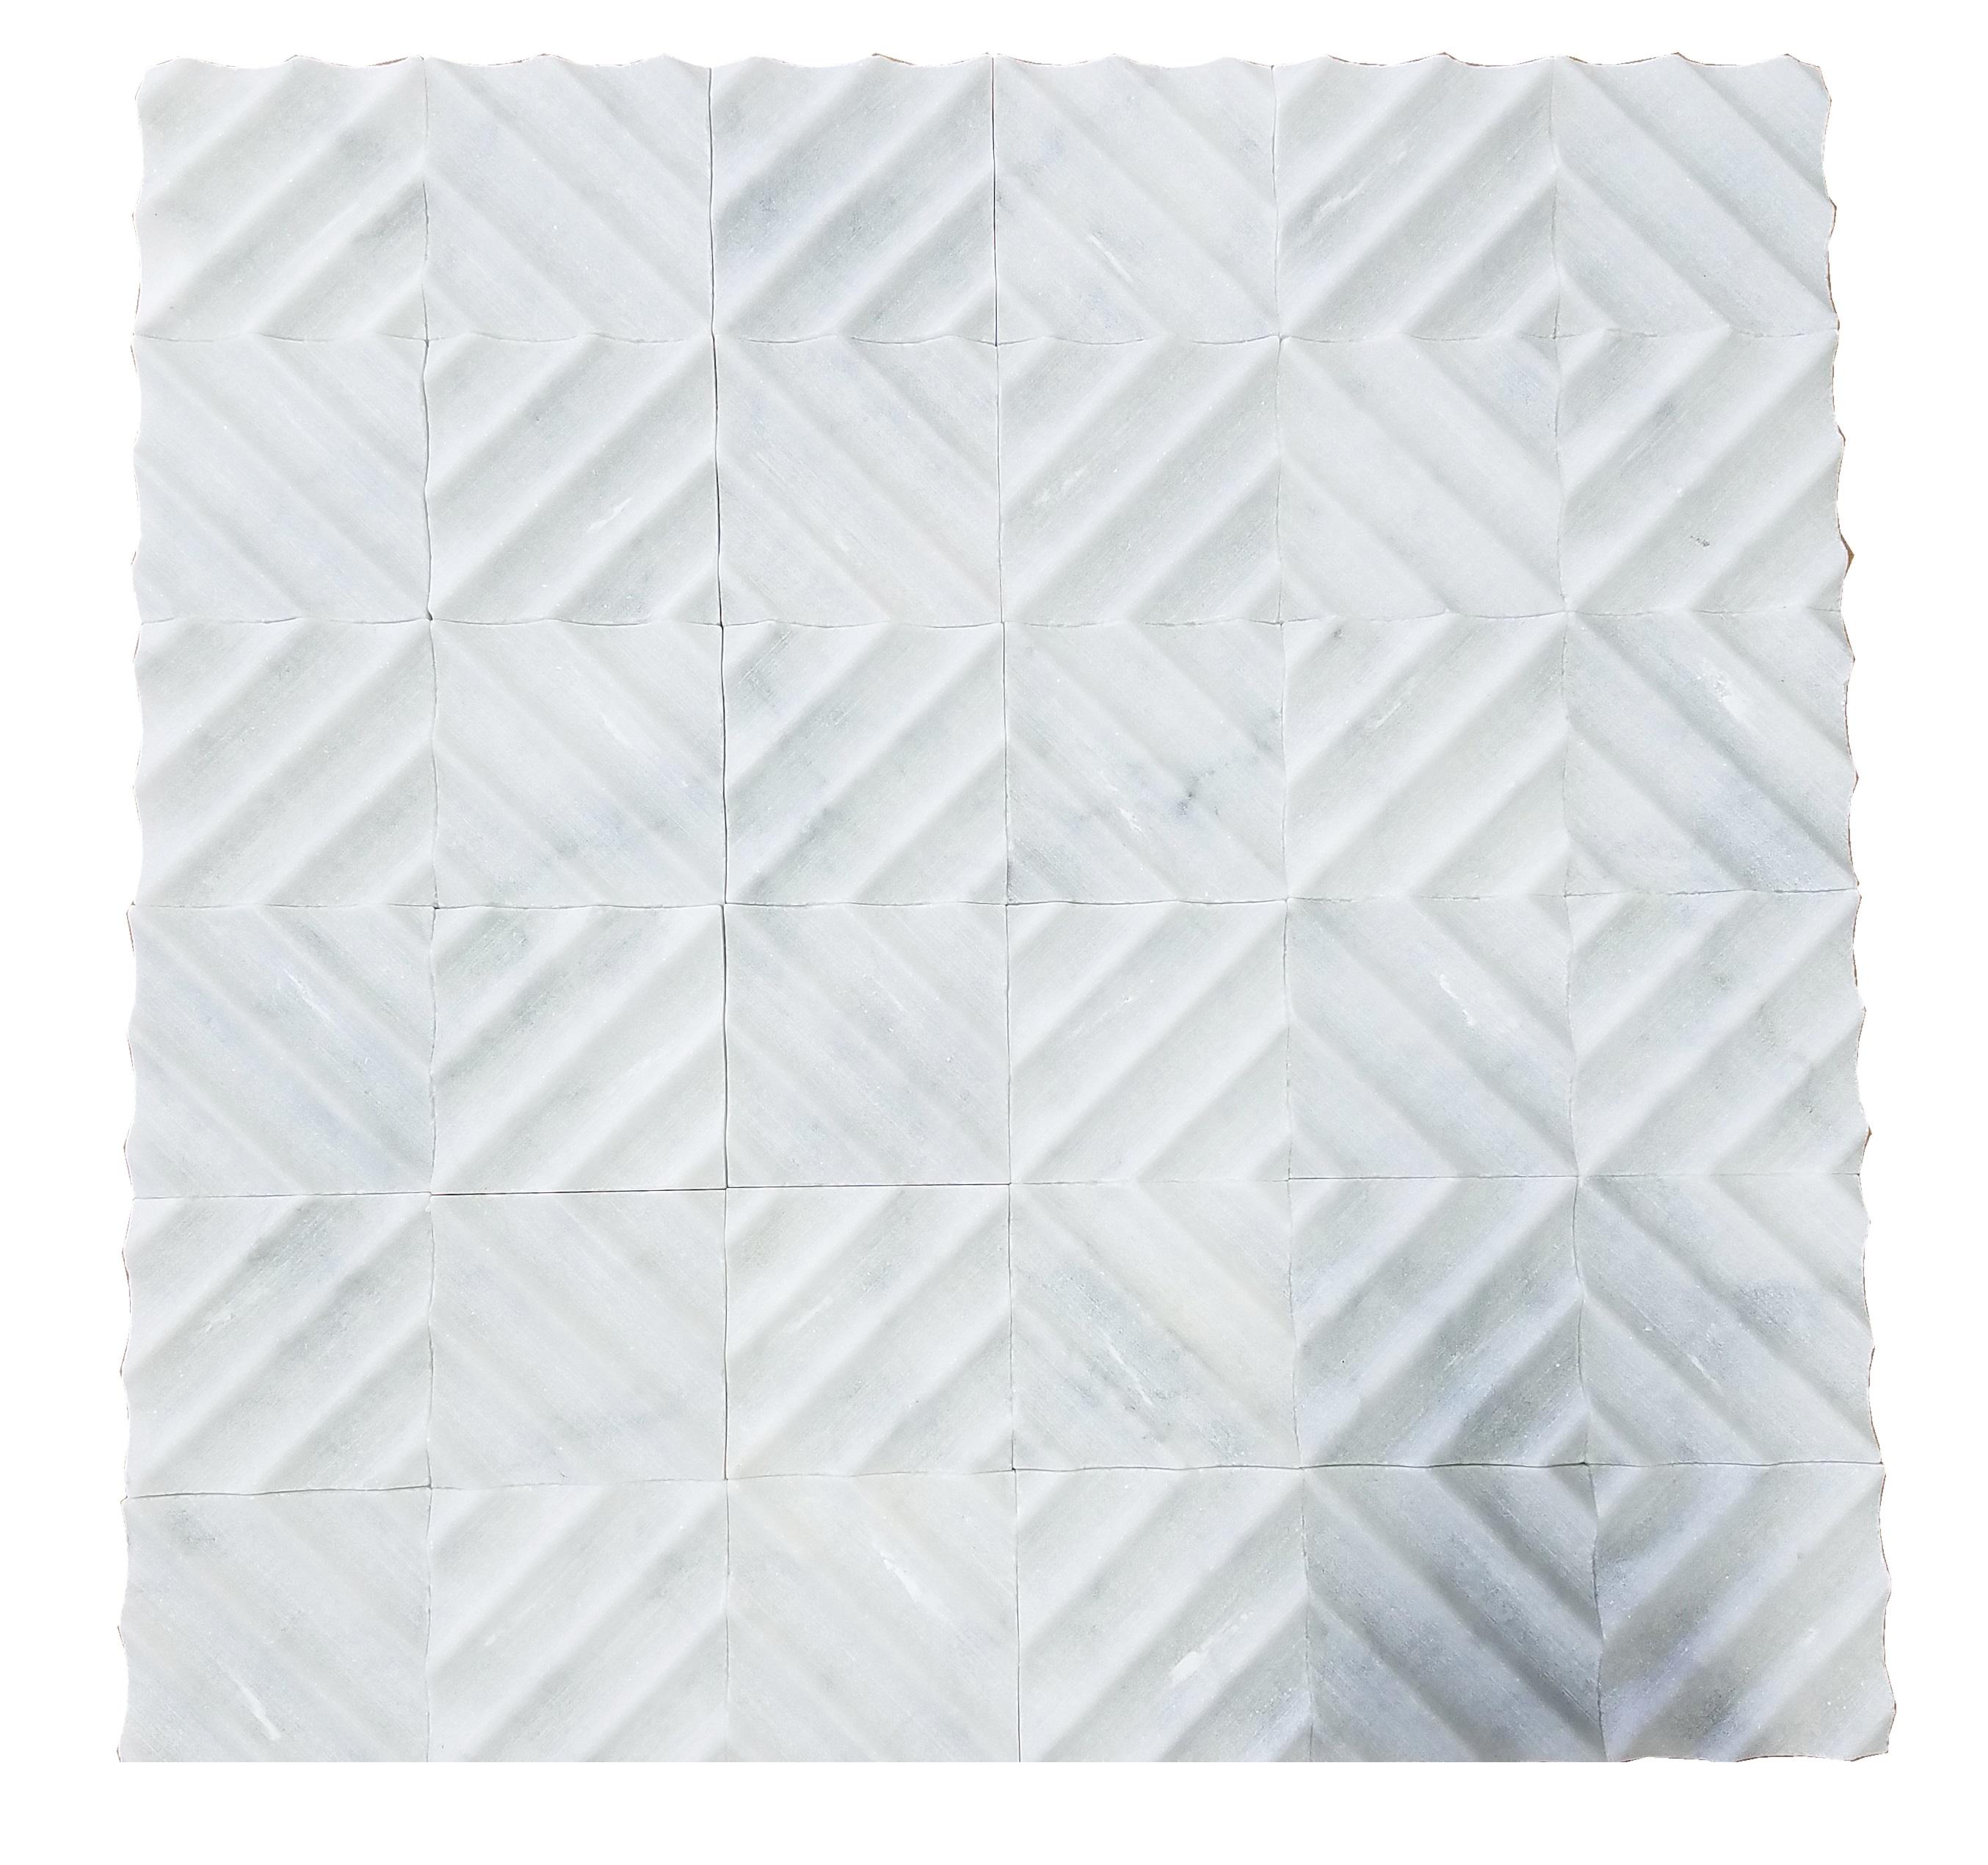 MA229-RQ  White Carrara Marble Mosaic Honed